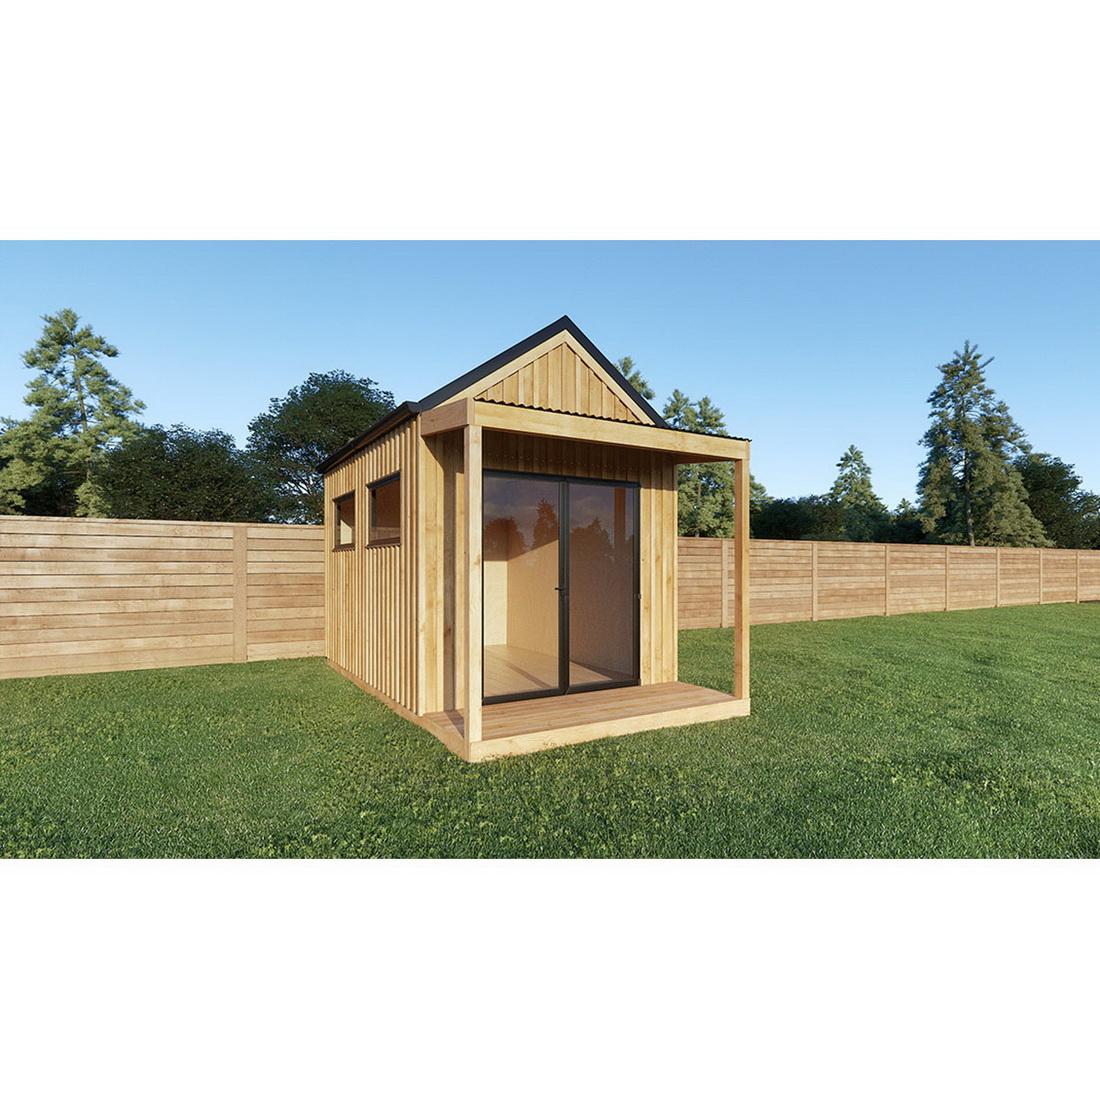 Sanders Weekender Cabin including Mezze with Floor and Bearers Corrugate Roof 10M2